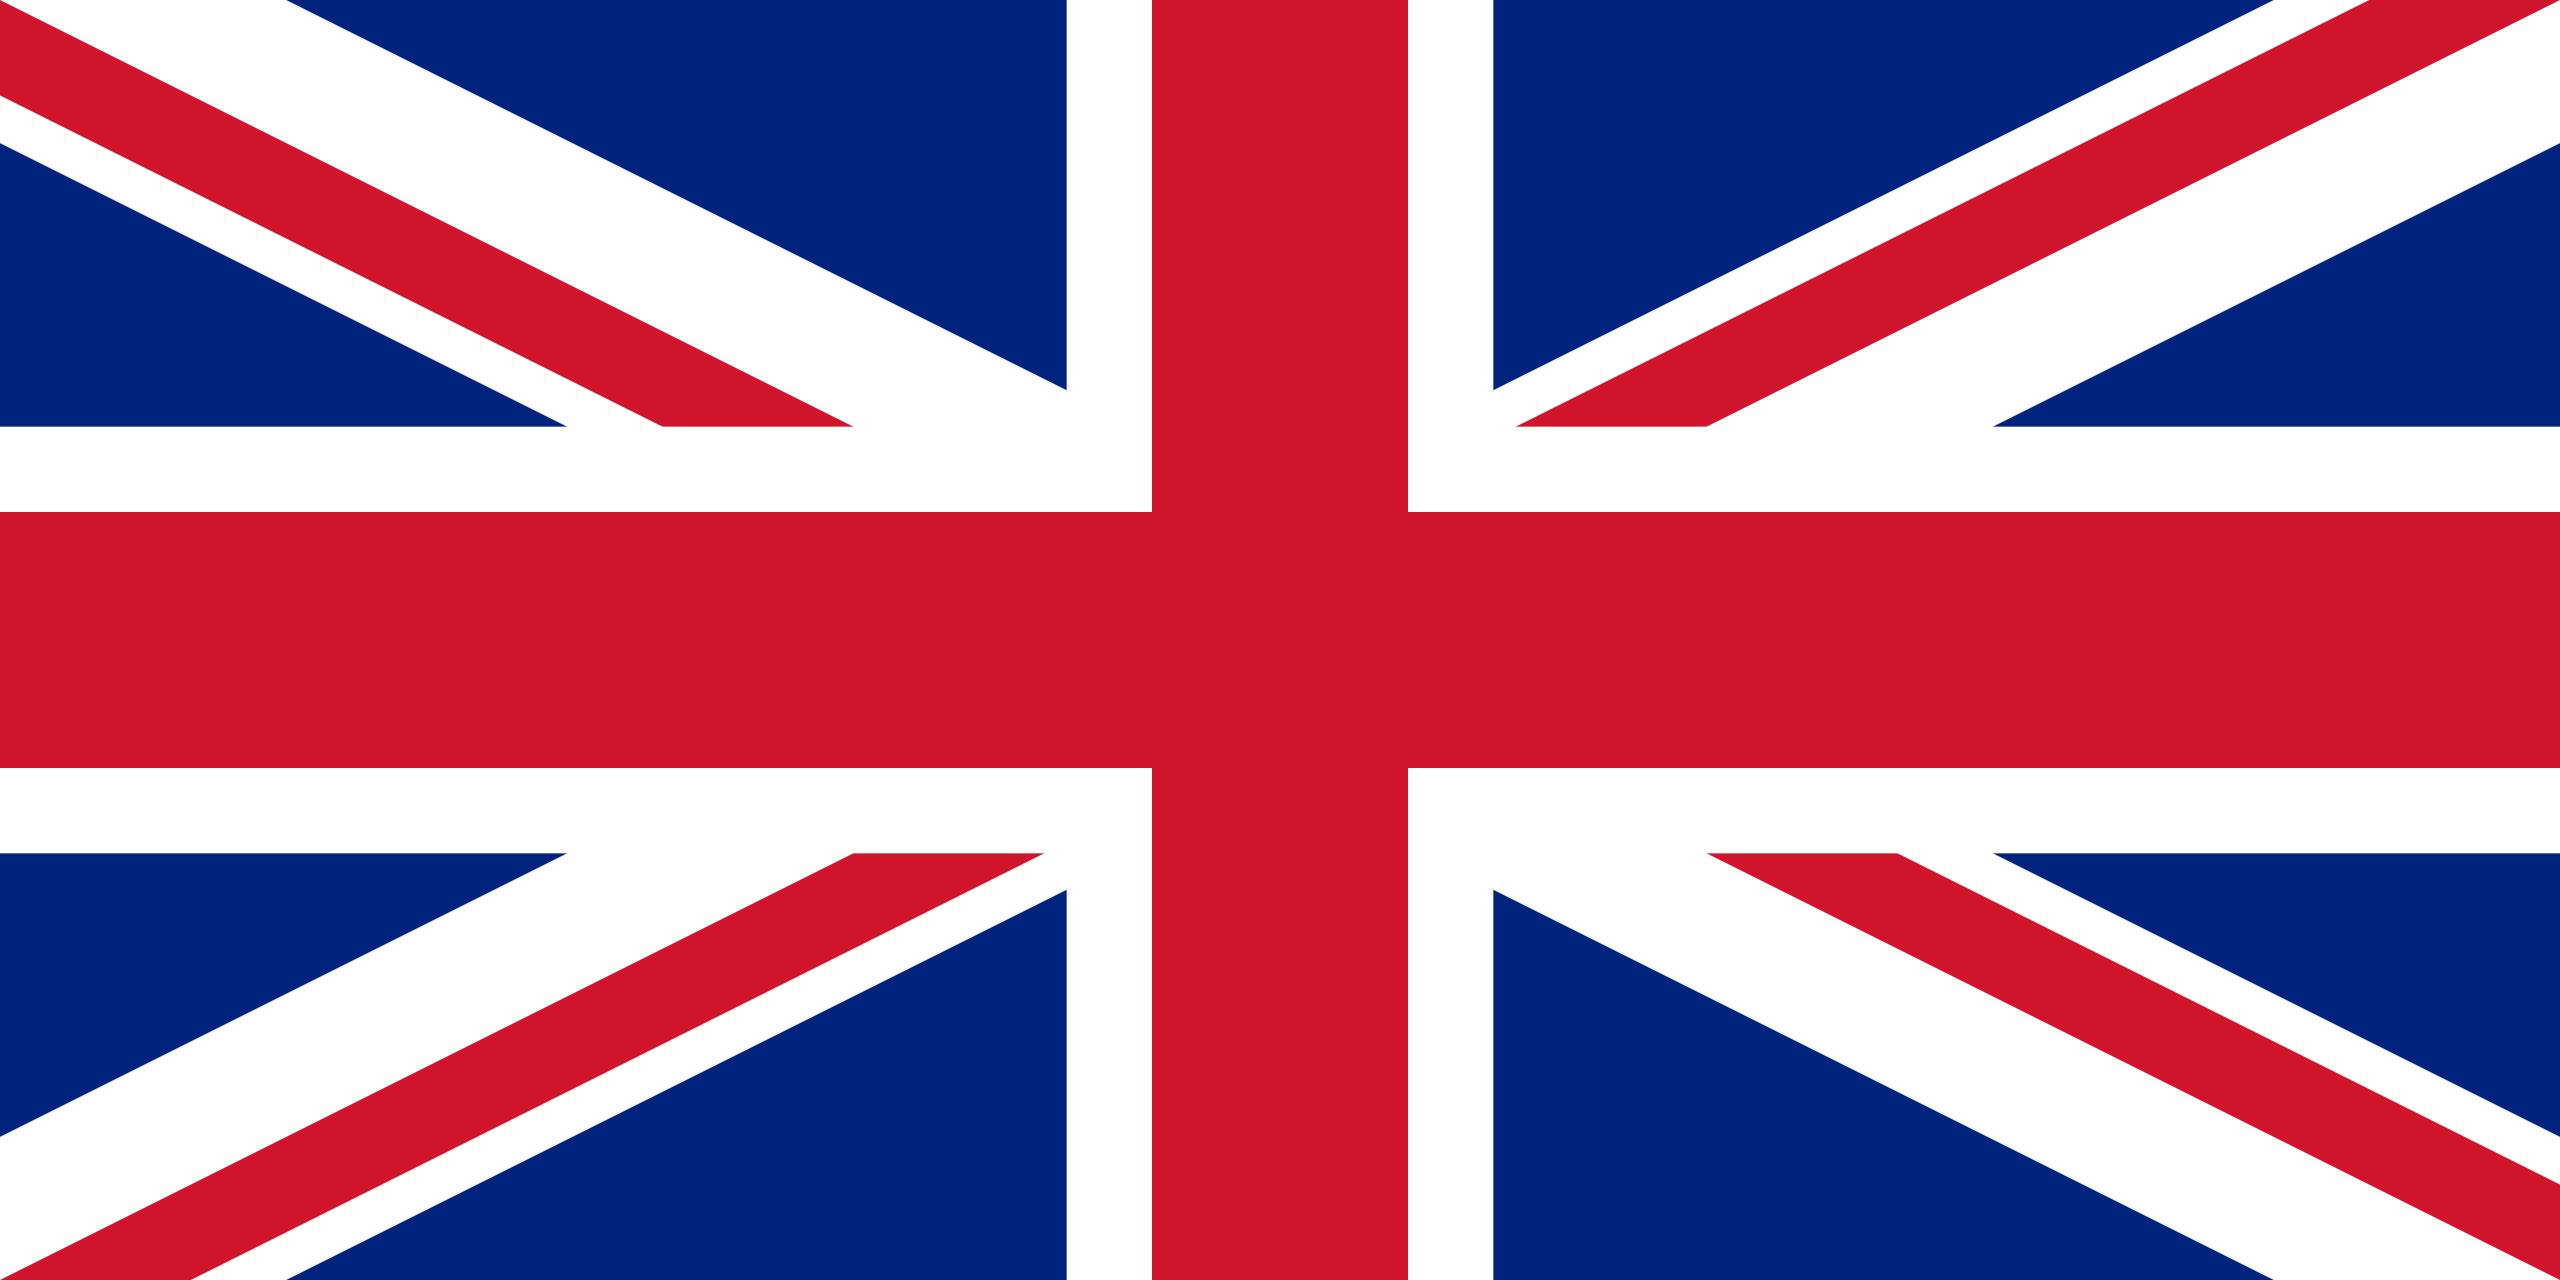 http://www.flagistrany.ru/data/flags/ultra/gb.png